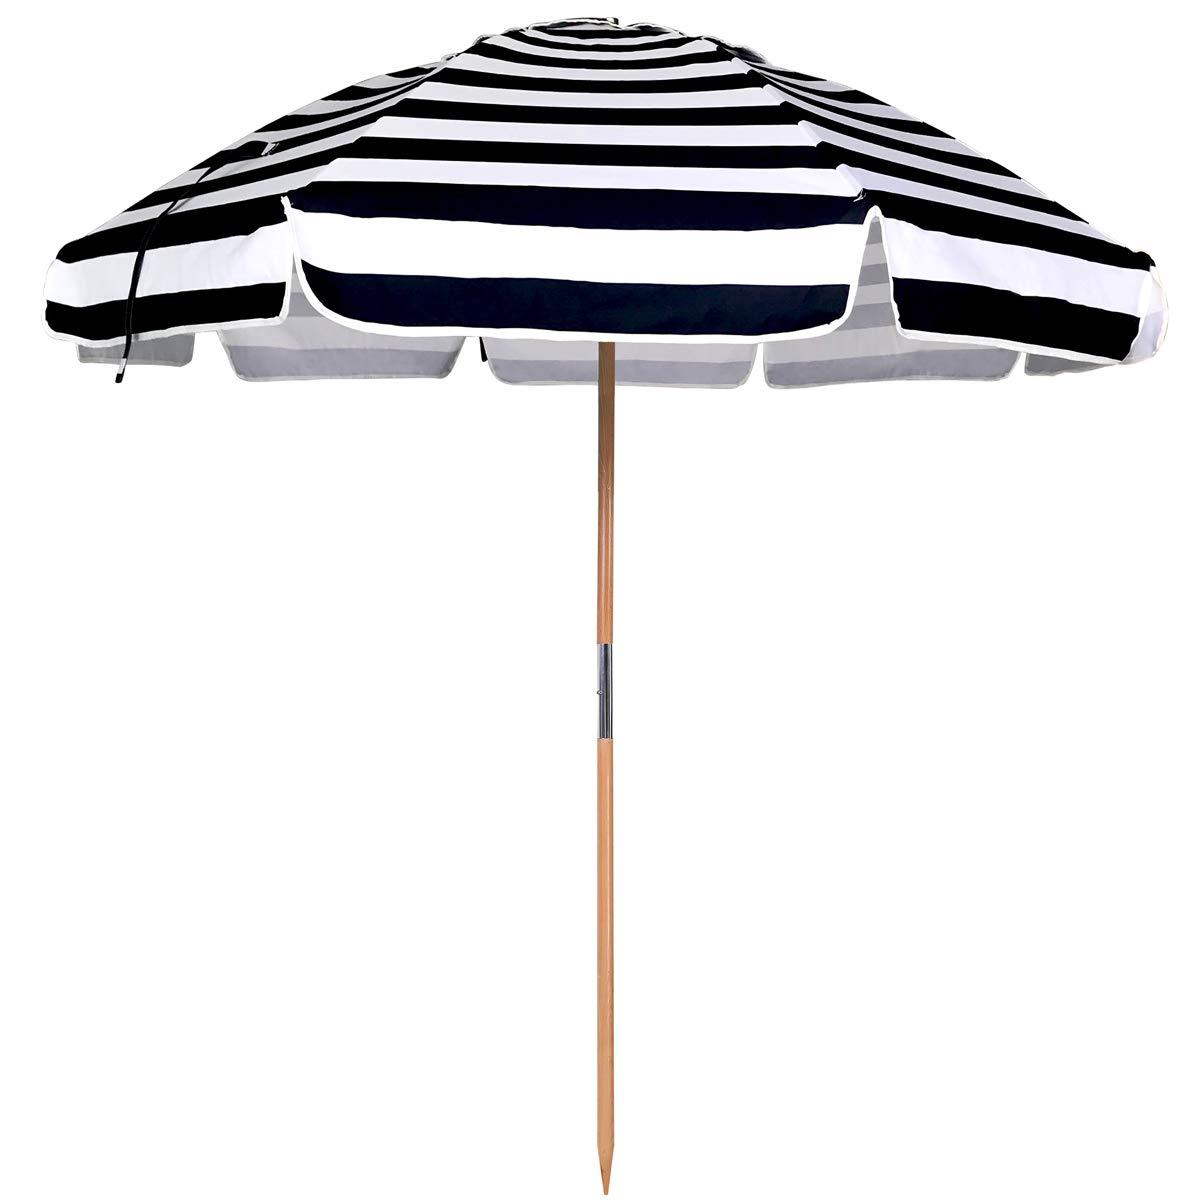 AMMSUN 7.5ft Commercial Grade Patio Beach Umbrella with Air- Vent Ash Wood Pole & Carry Bag (230cm, Stripe Blue)